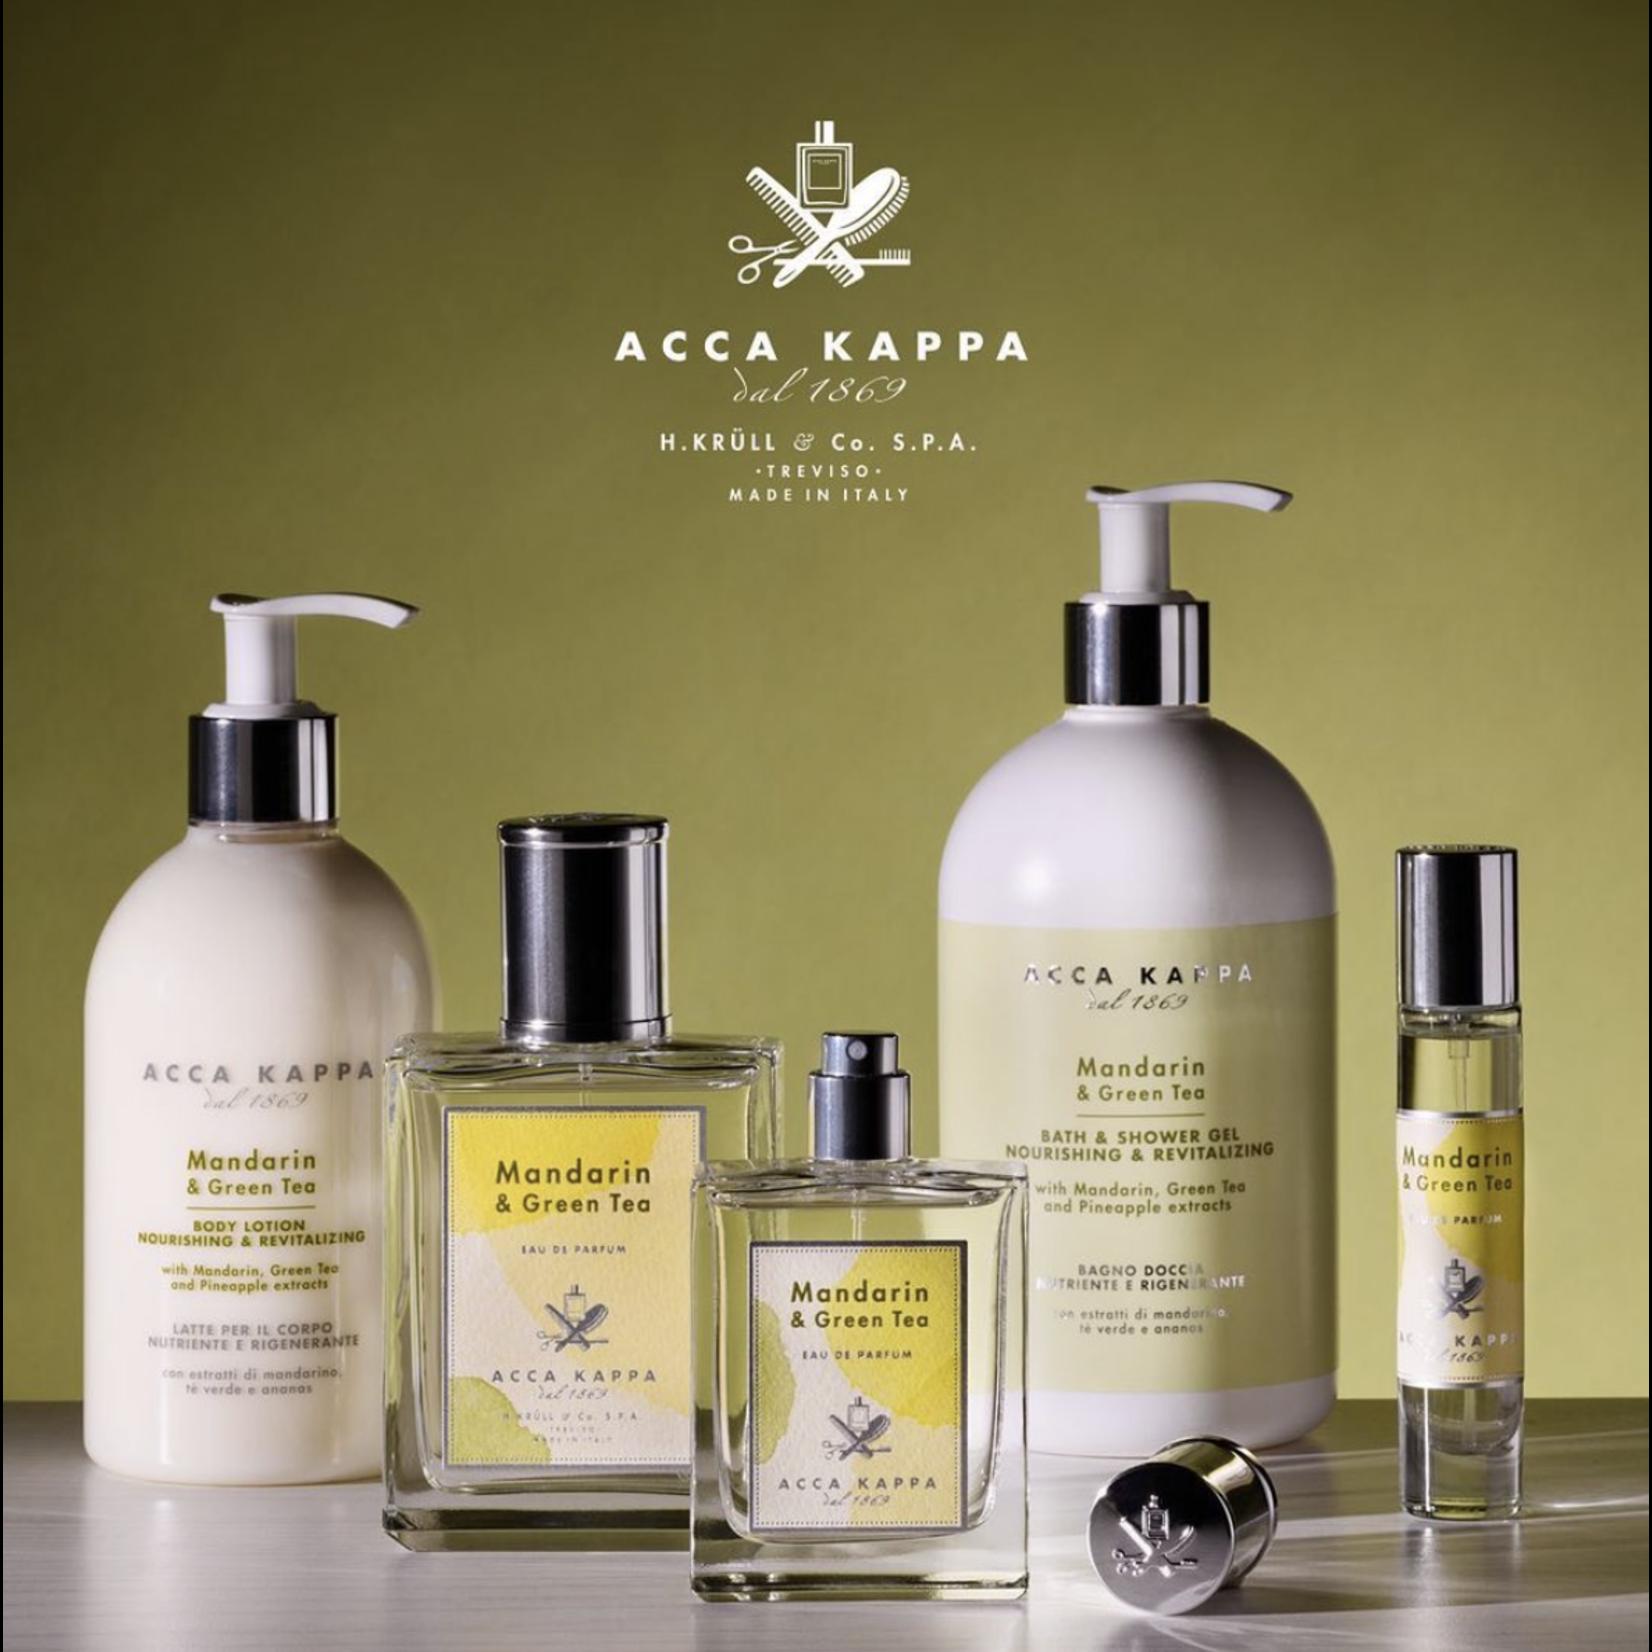 ACCA KAPPA ACCA KAPPA · MANDARIN & GREEN TEA 100ML